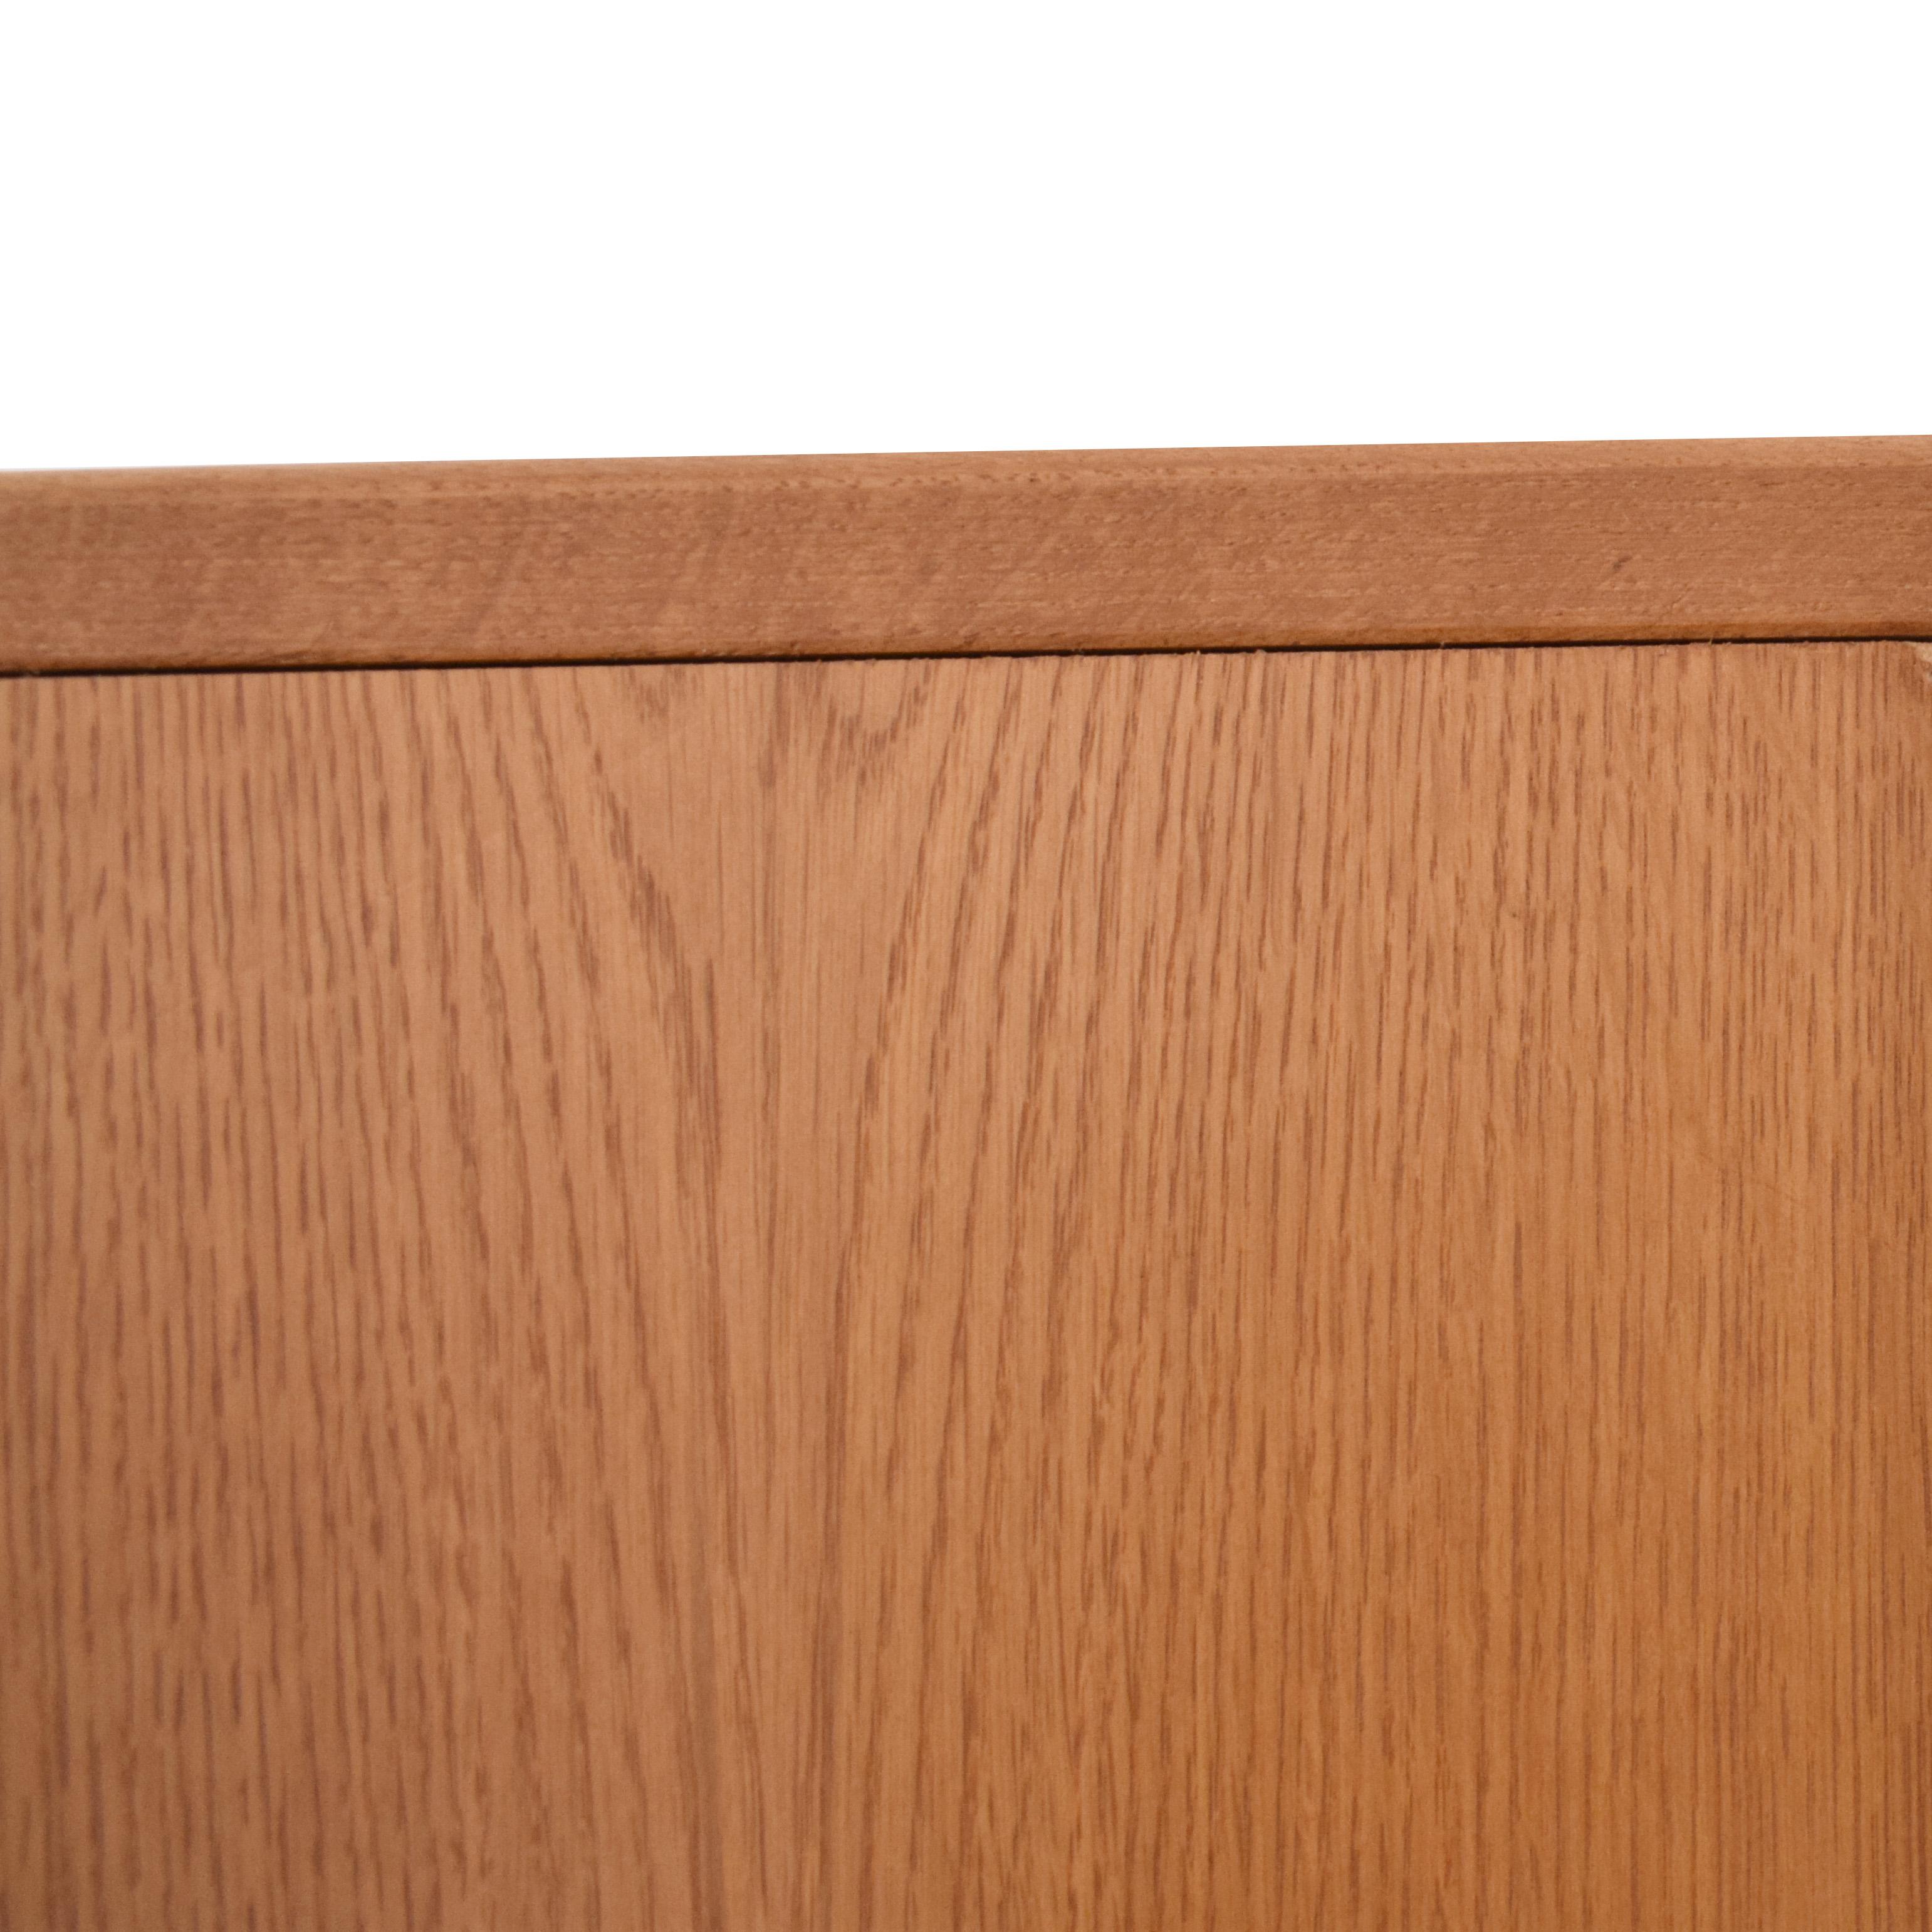 Six Drawer and Cabinet Wardrobe nj